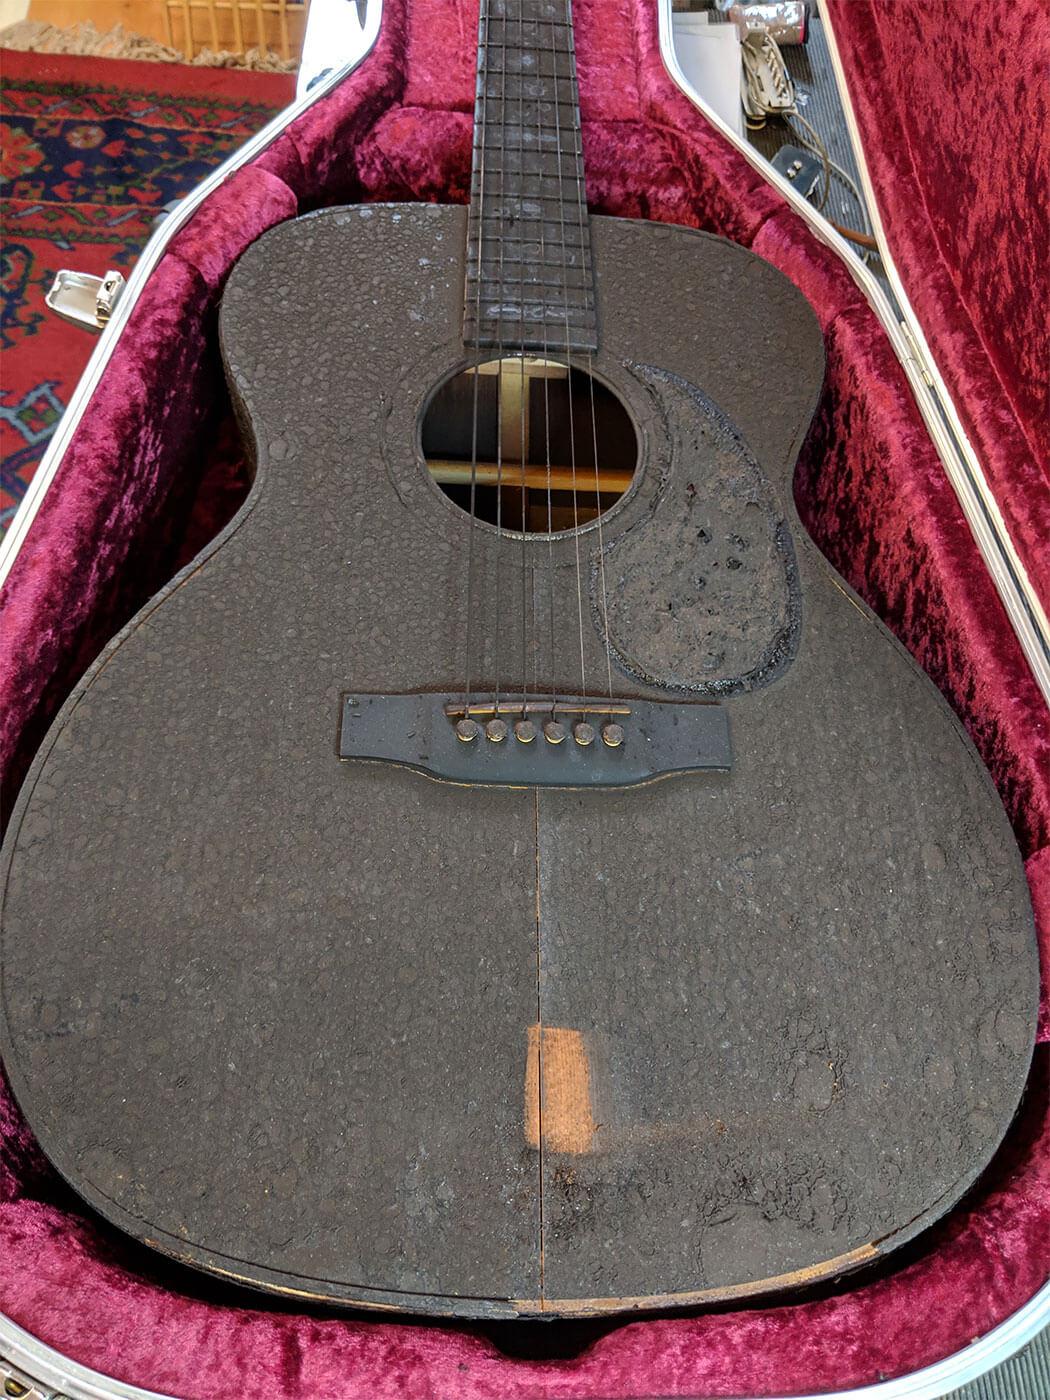 Monty's Guitar Restoration